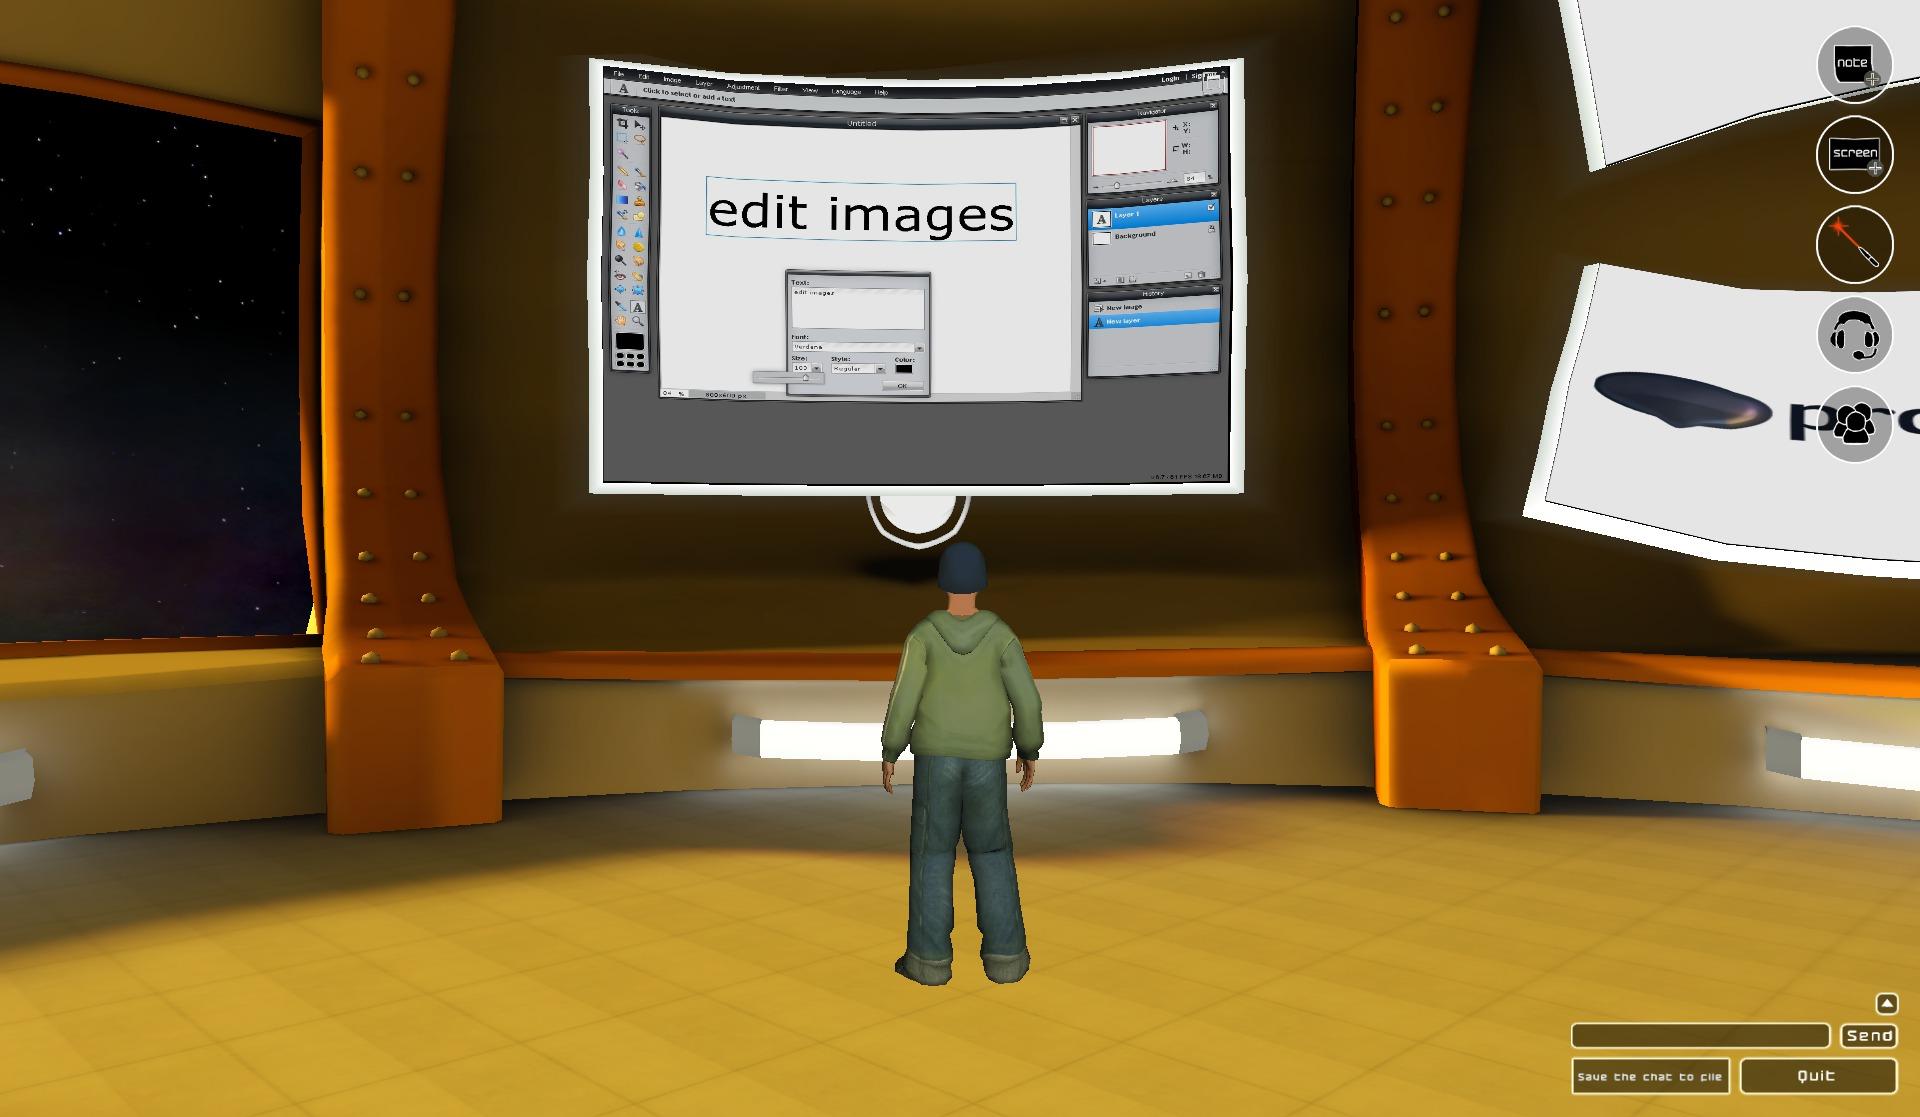 project_room_screenshot_03